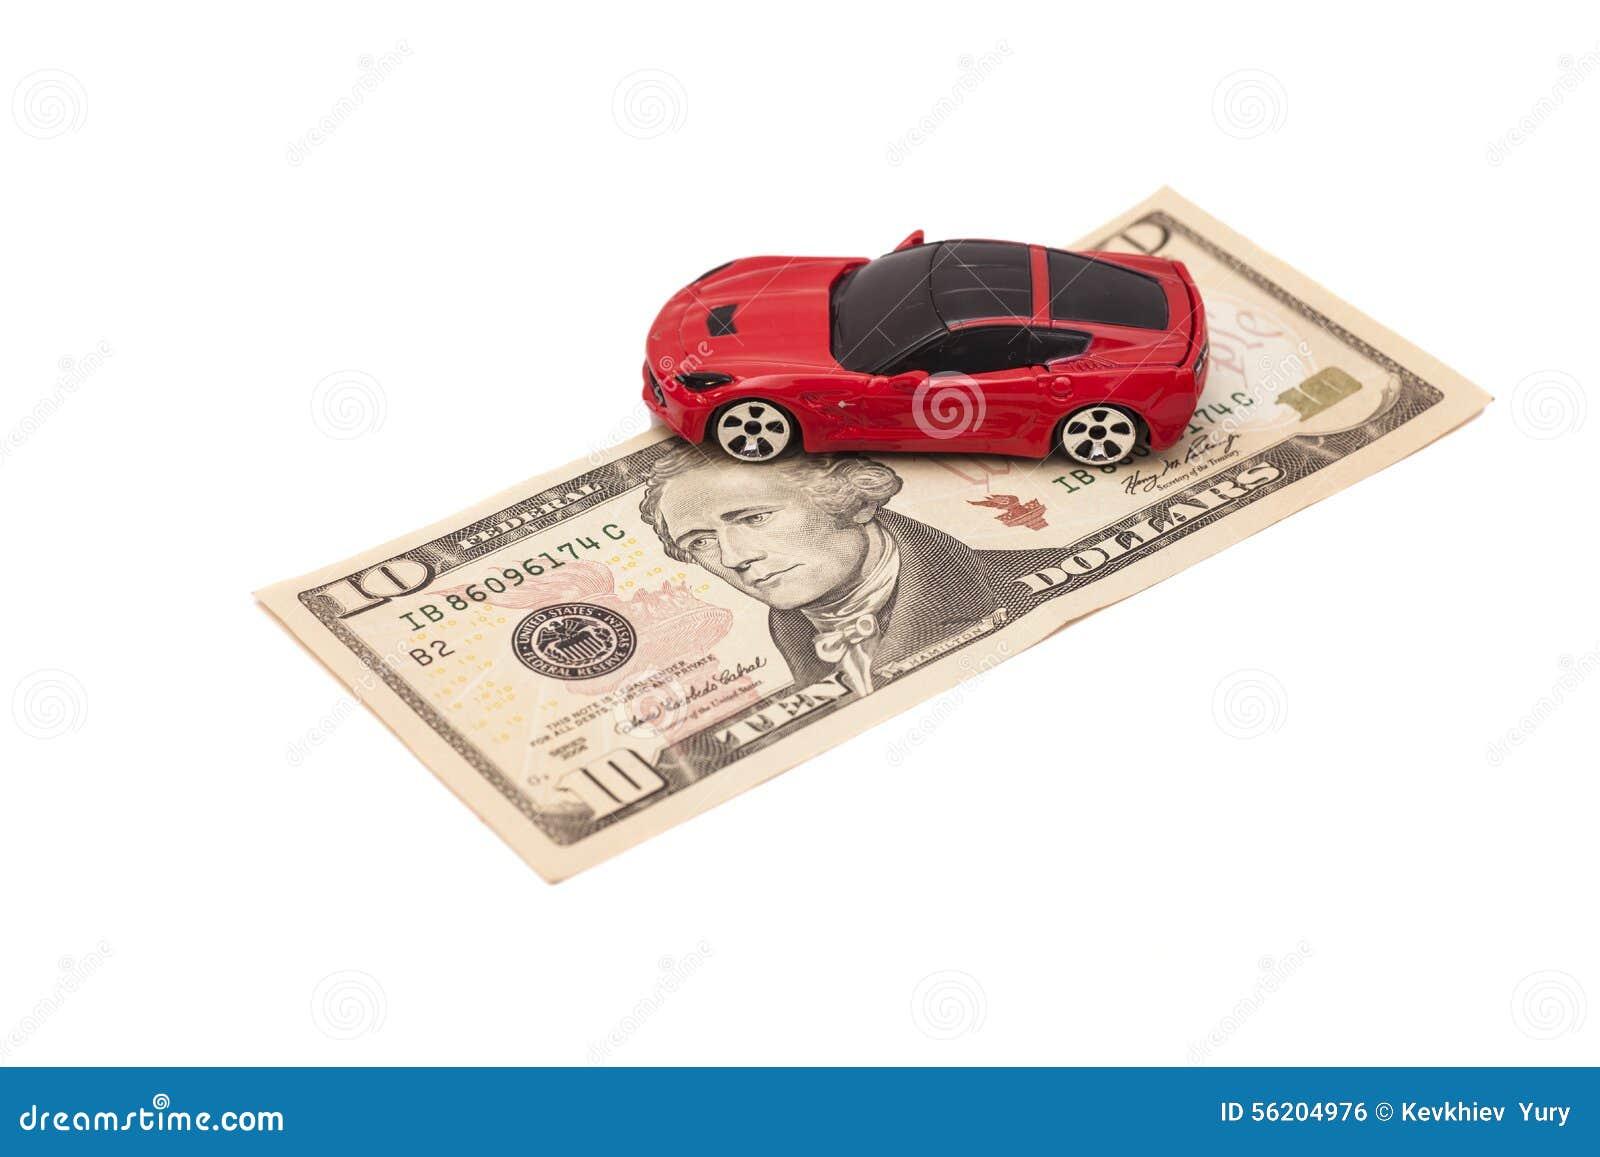 billet de banque voiture